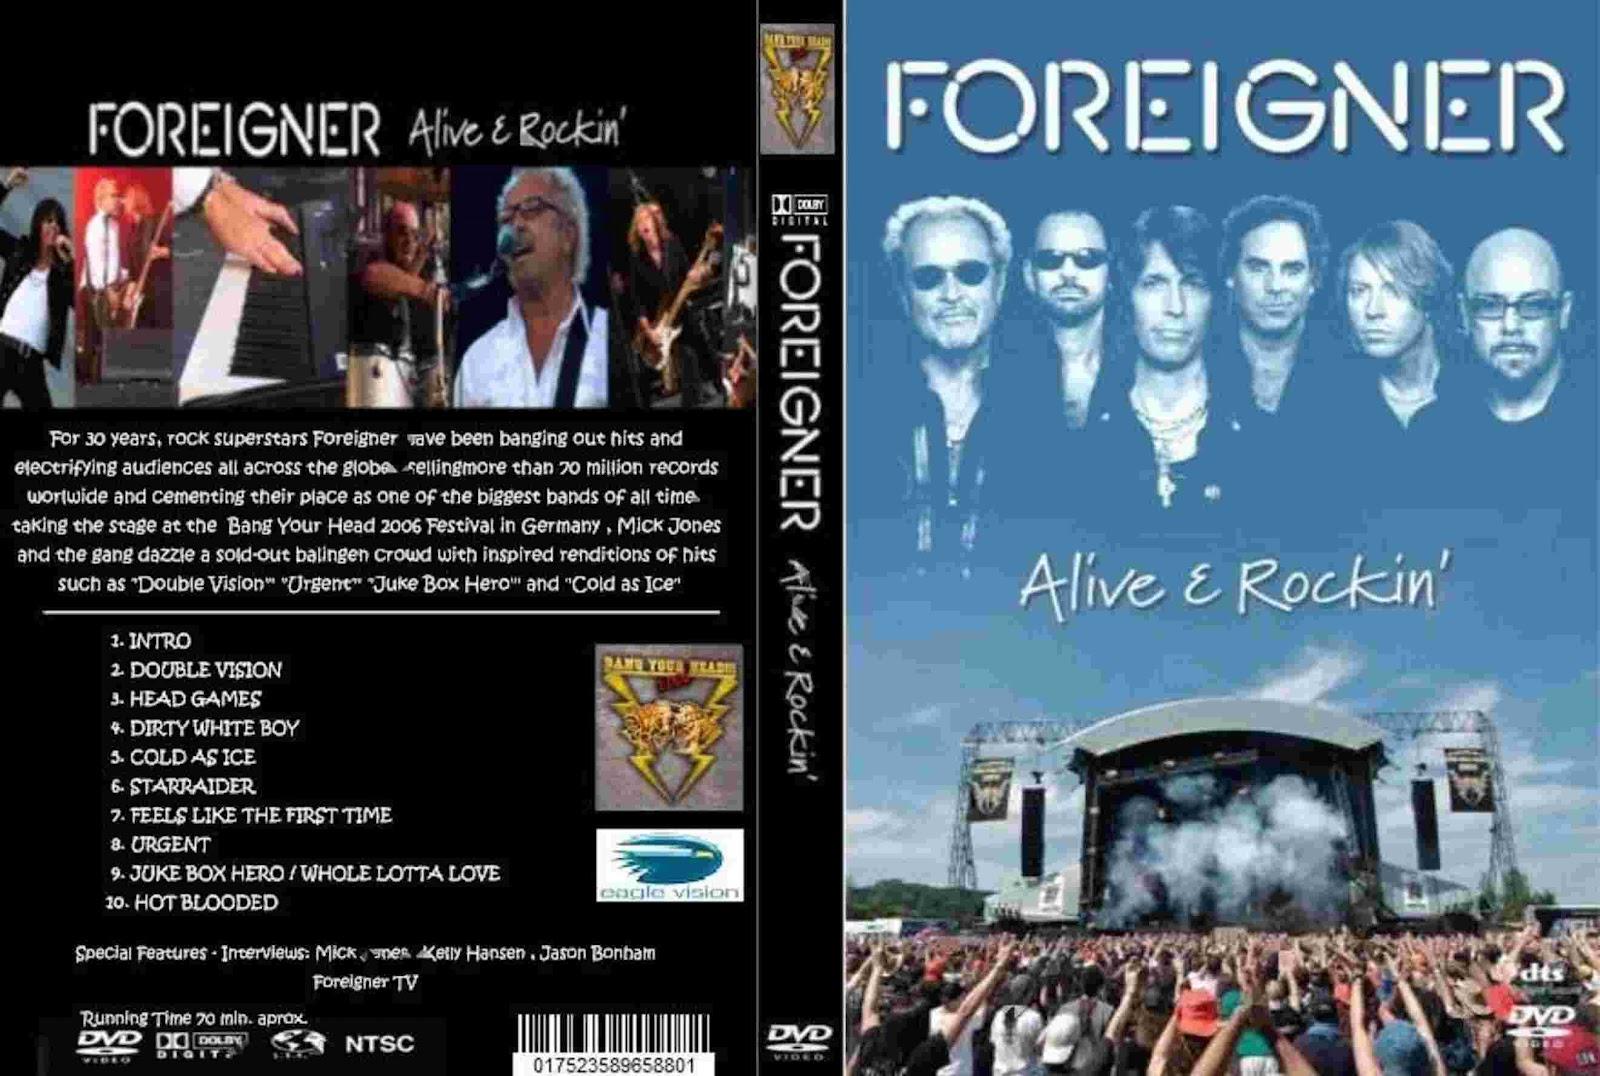 http://2.bp.blogspot.com/-EgBwAYh_zyU/T7V_eScp62I/AAAAAAAAEbk/qDseBs5m614/s1600/Foreigner+-+Alive+And+Rockin\'+-+Front.jpg